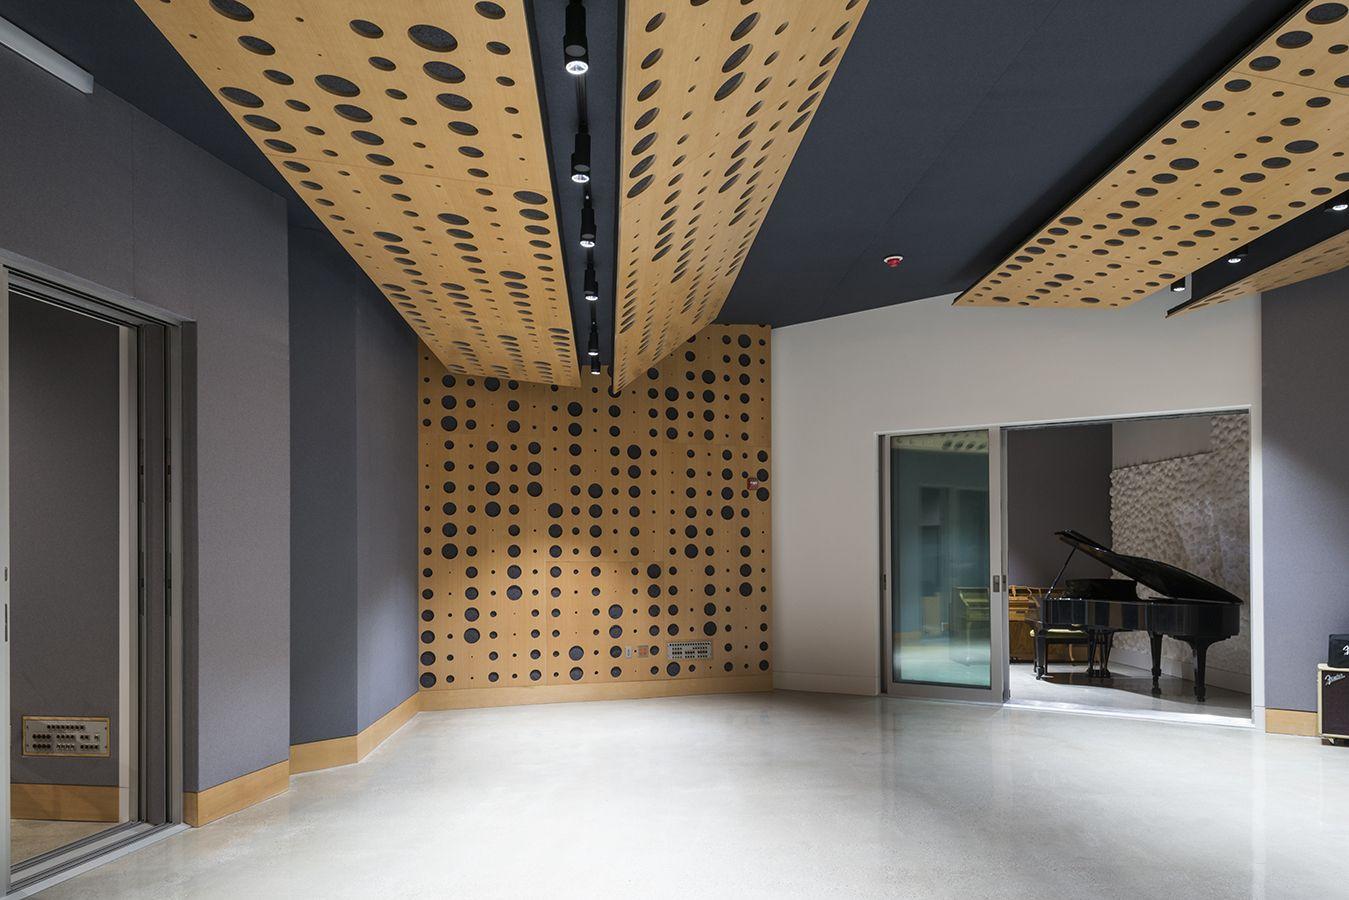 Elbo Studios, Glendale, CA, nonzero\\architecture | 2016 Design ...